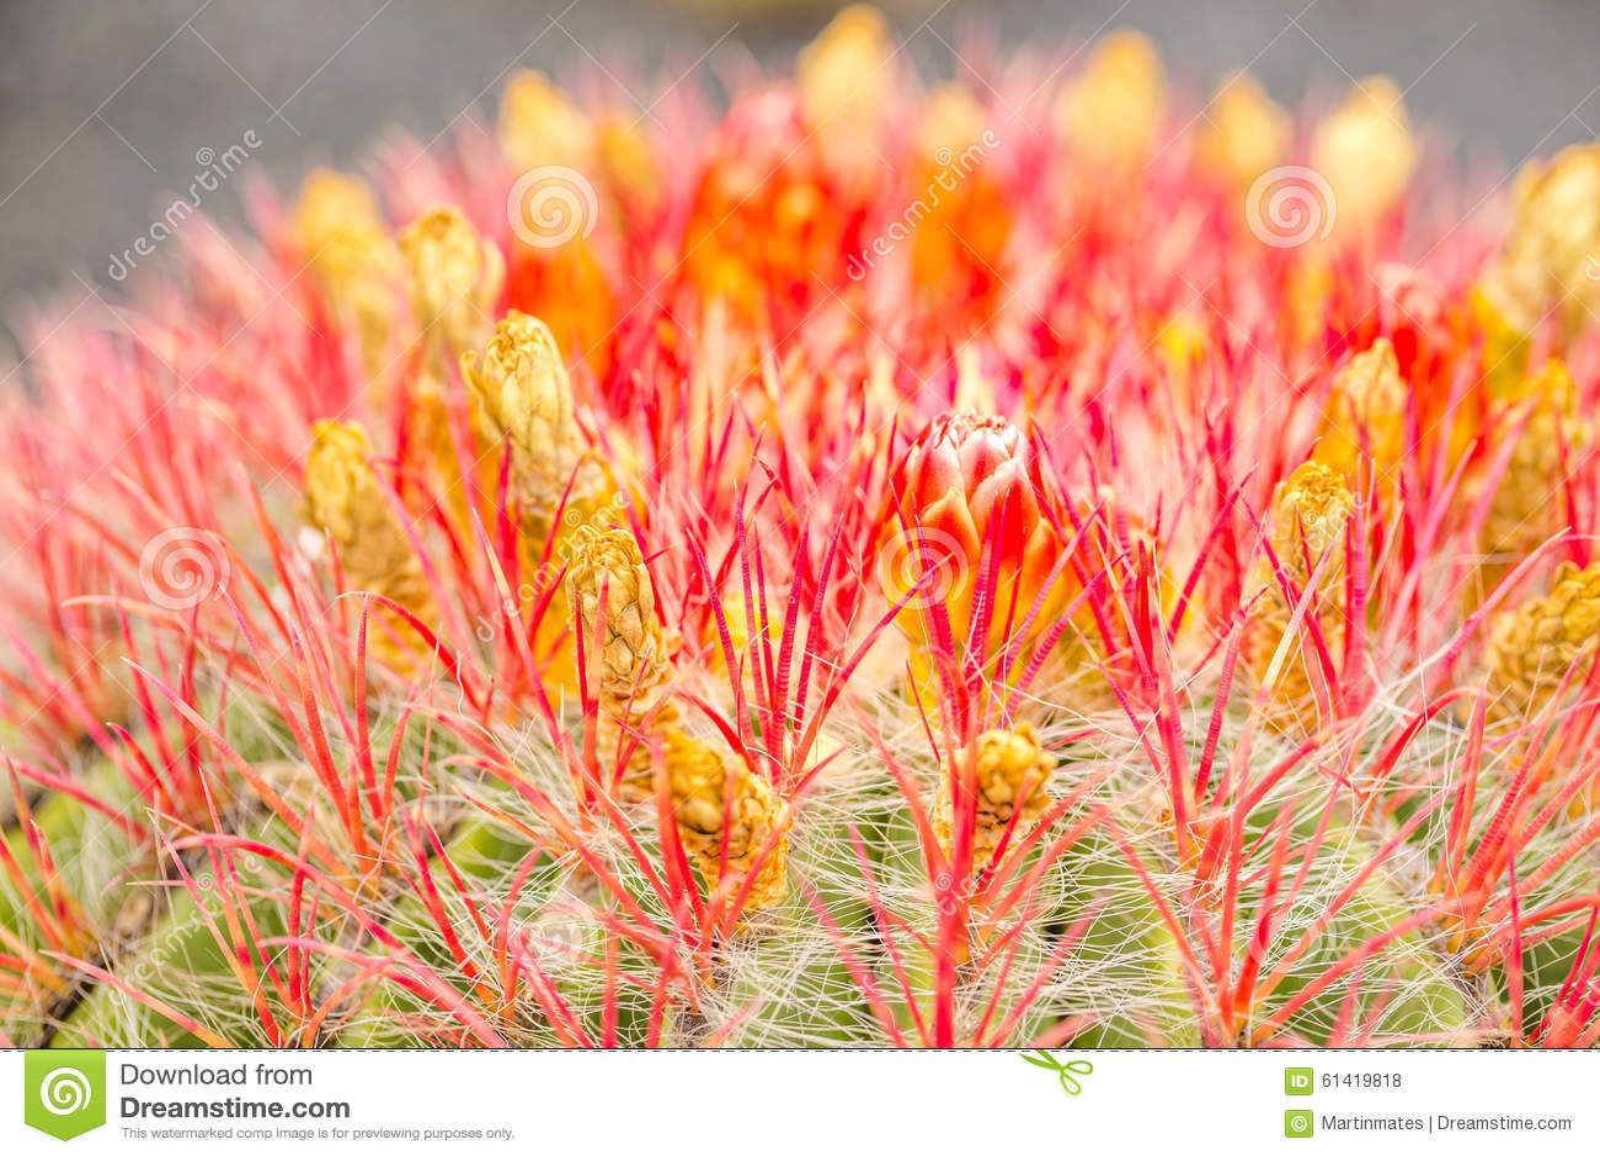 Detalj av den röda blomkaktuns